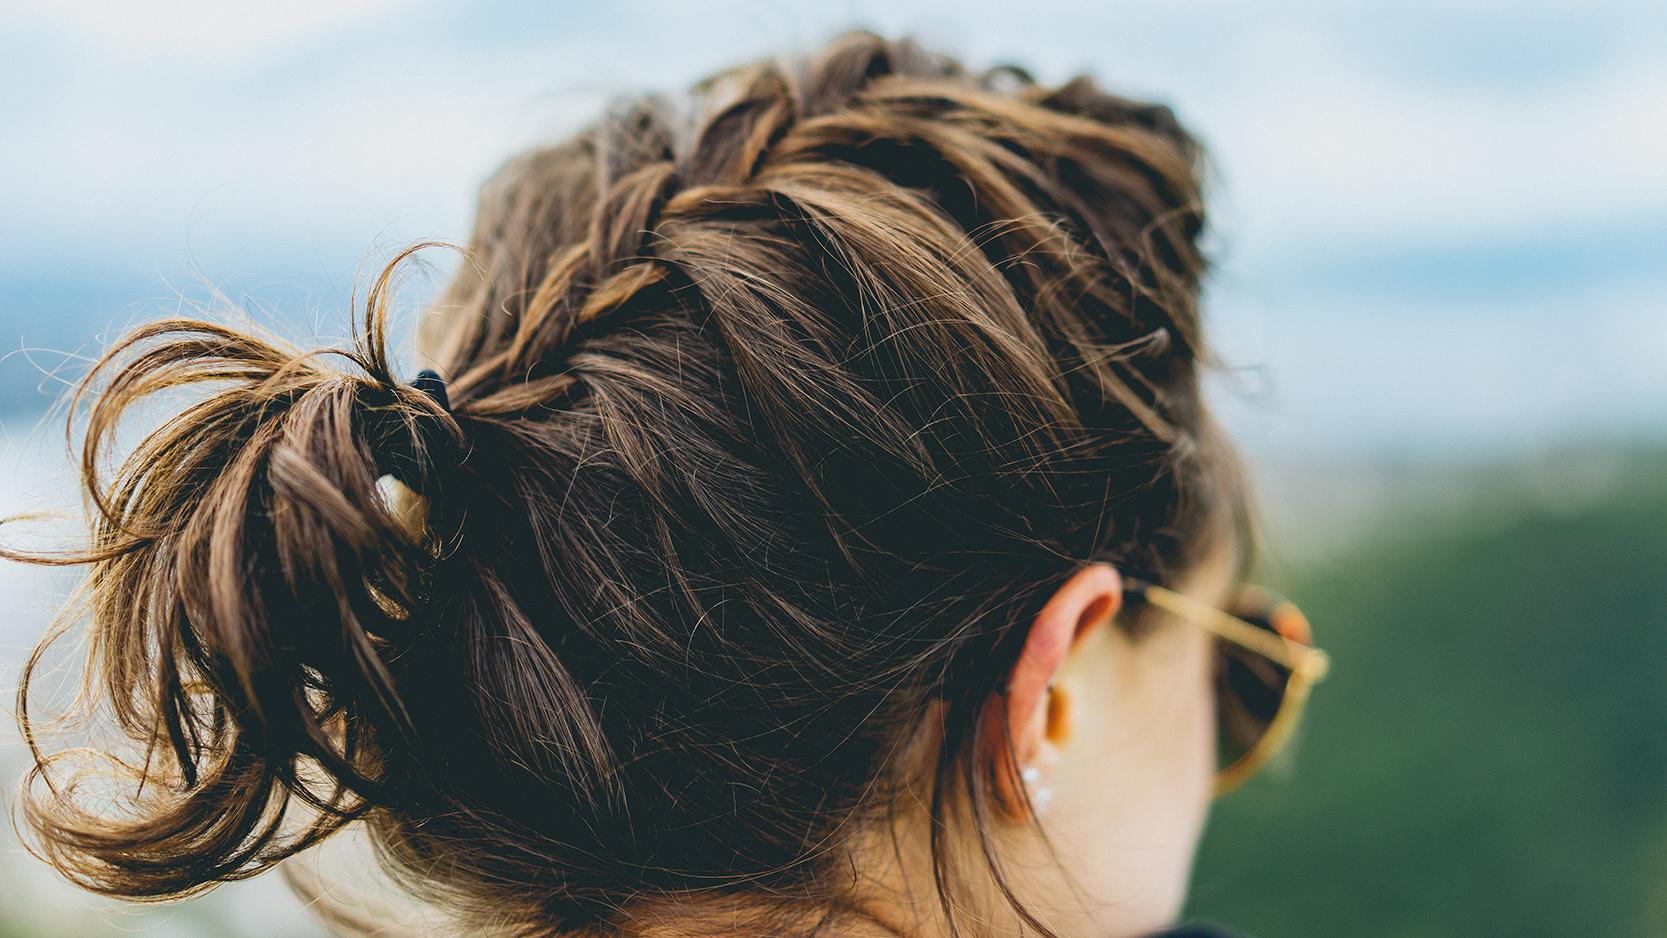 sveda i hårbotten